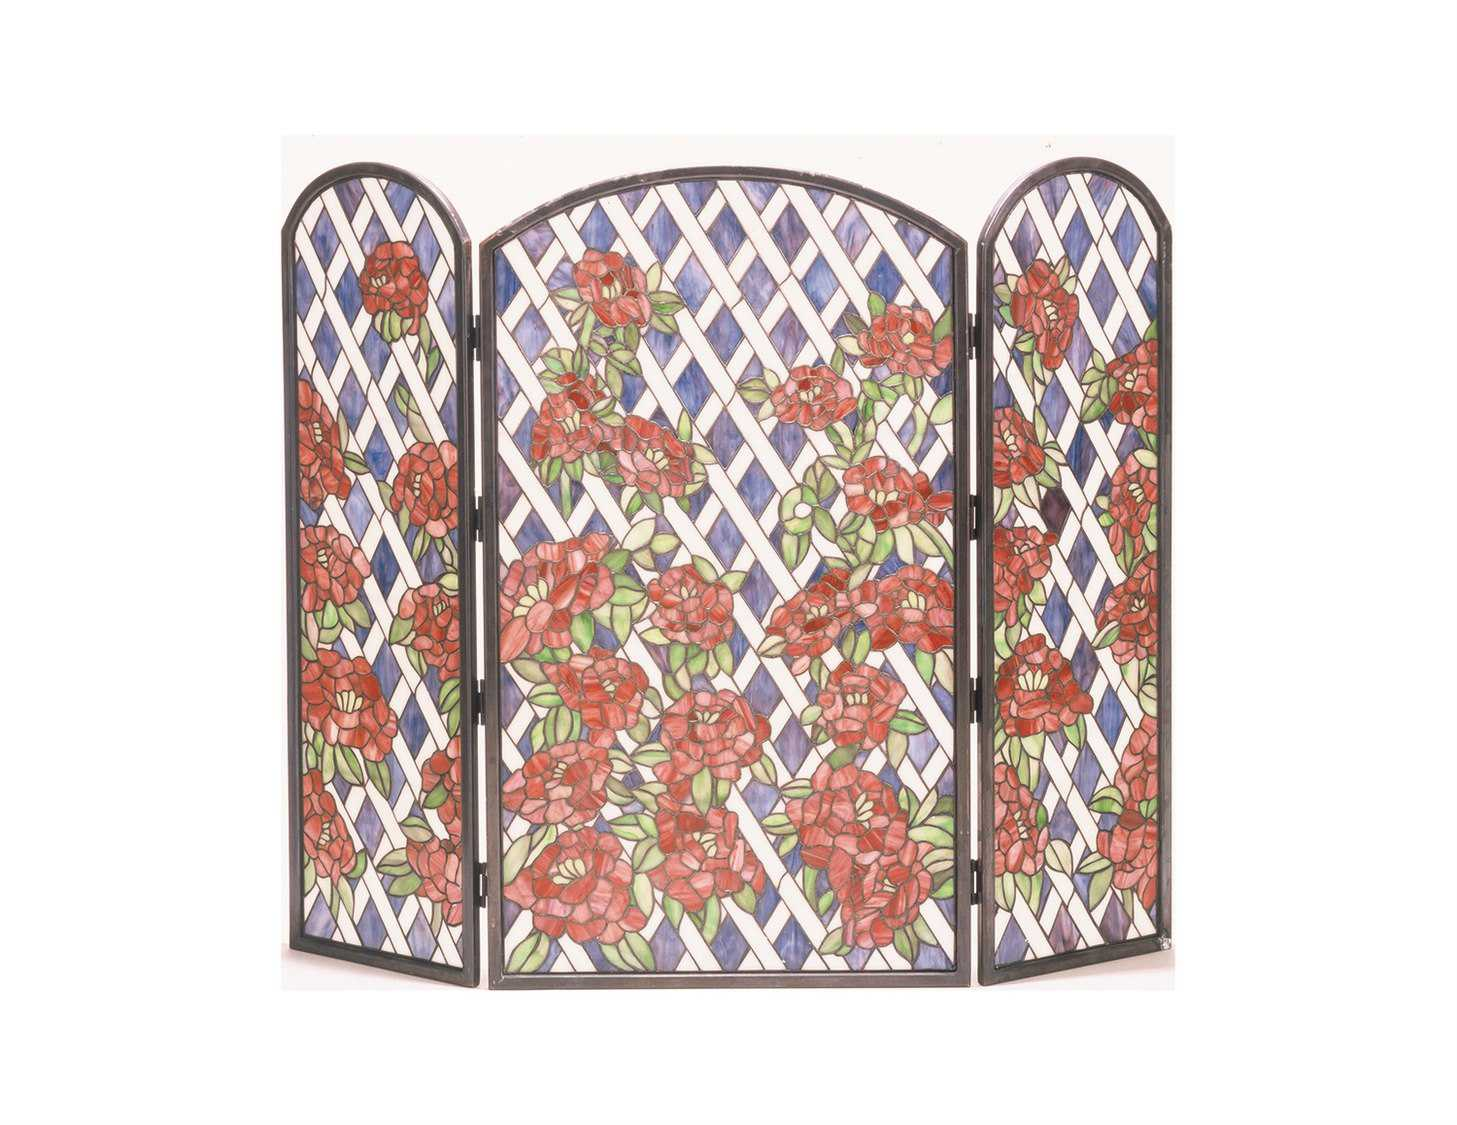 Meyda Tiffany Rose Trellis Folding Fireplace Screen My35744